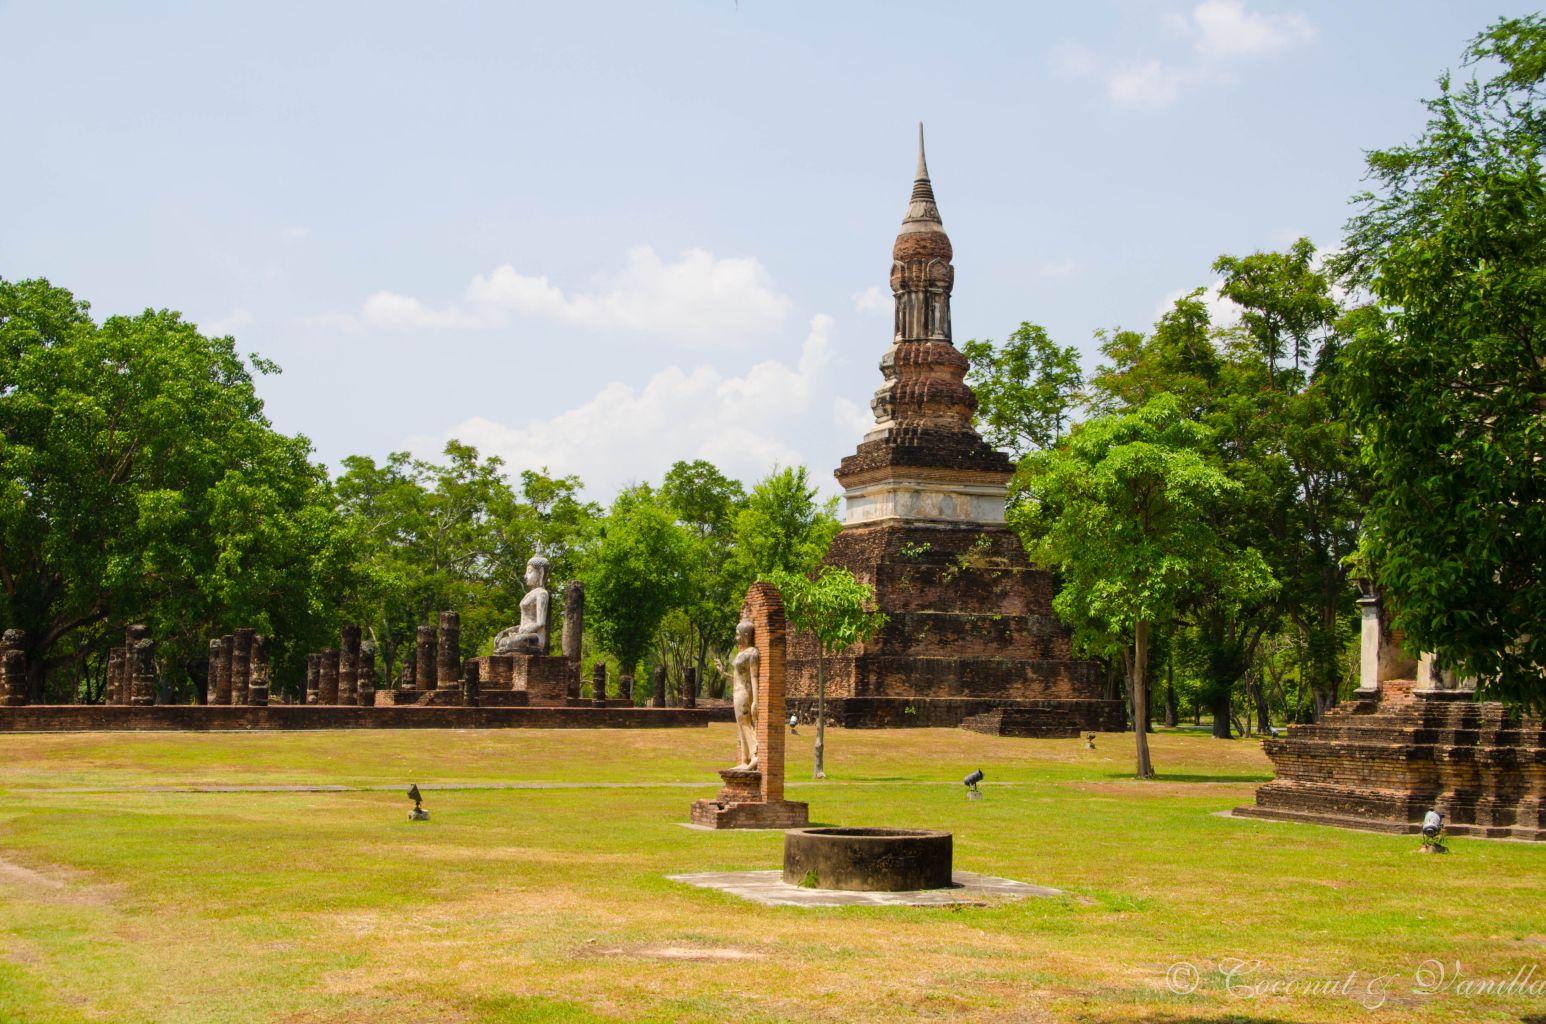 Tempel in Alt-Sukhothai by Coconut & Vanilla